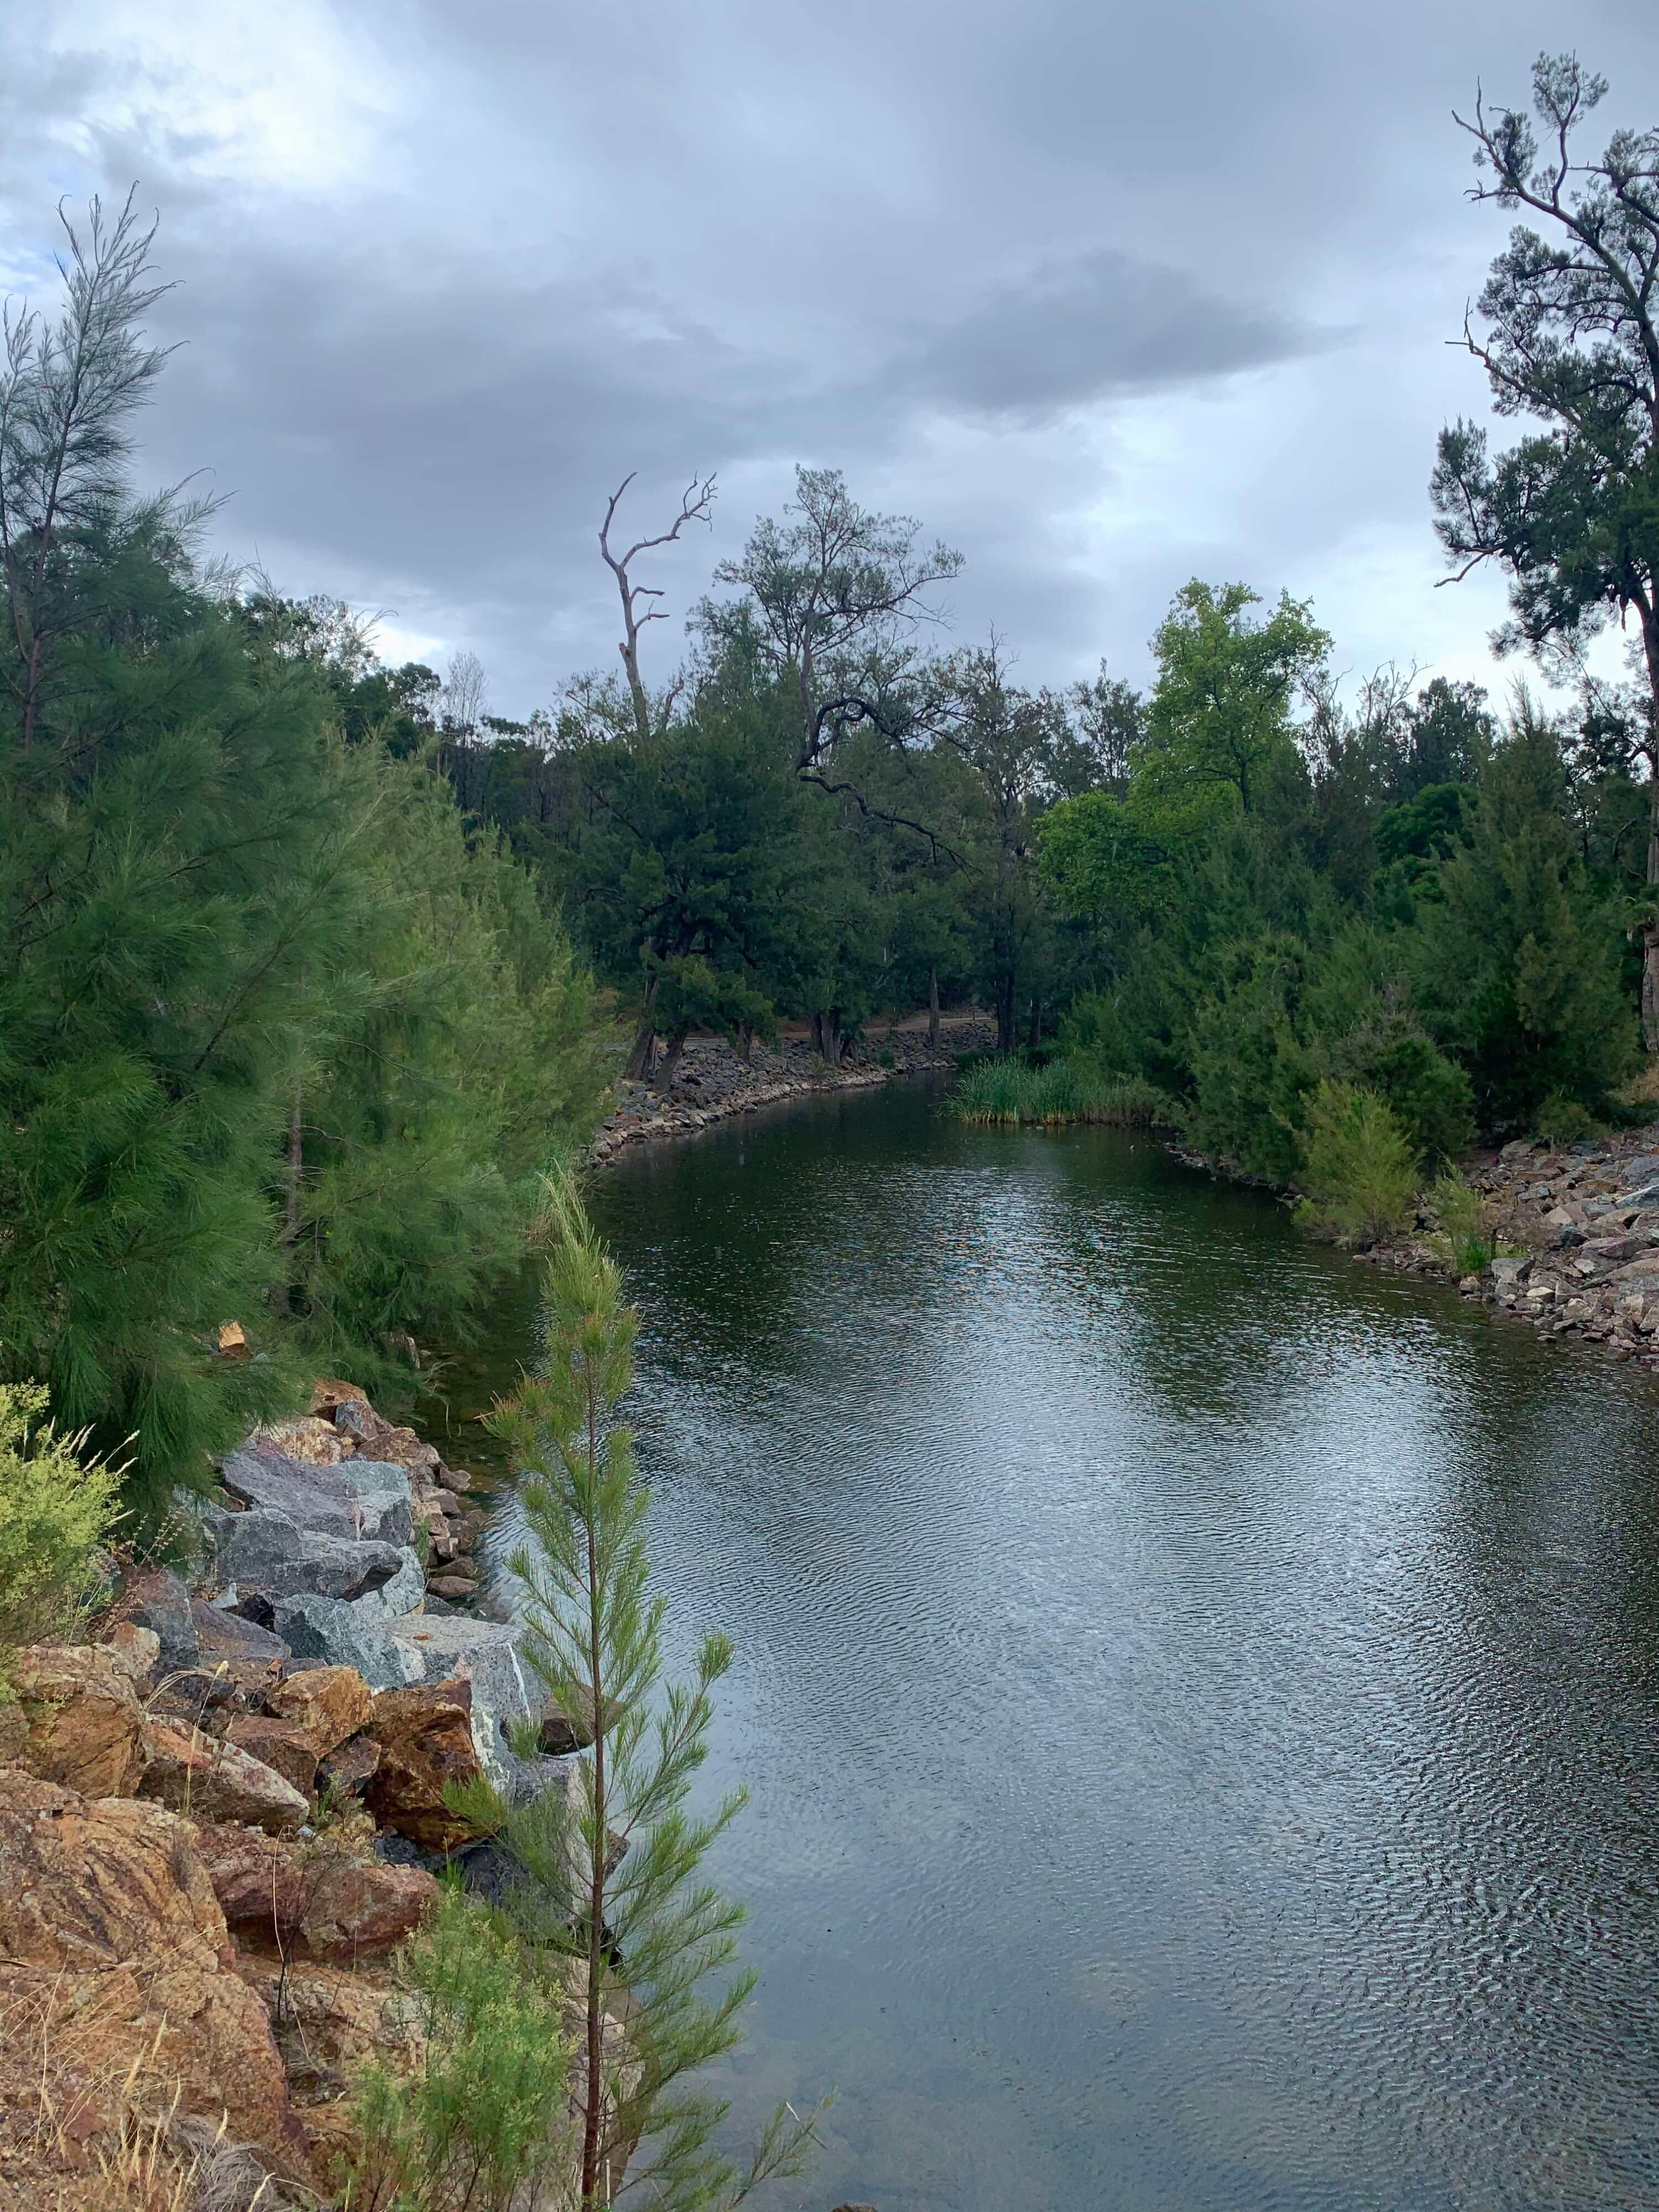 Cotter dam, Canberra